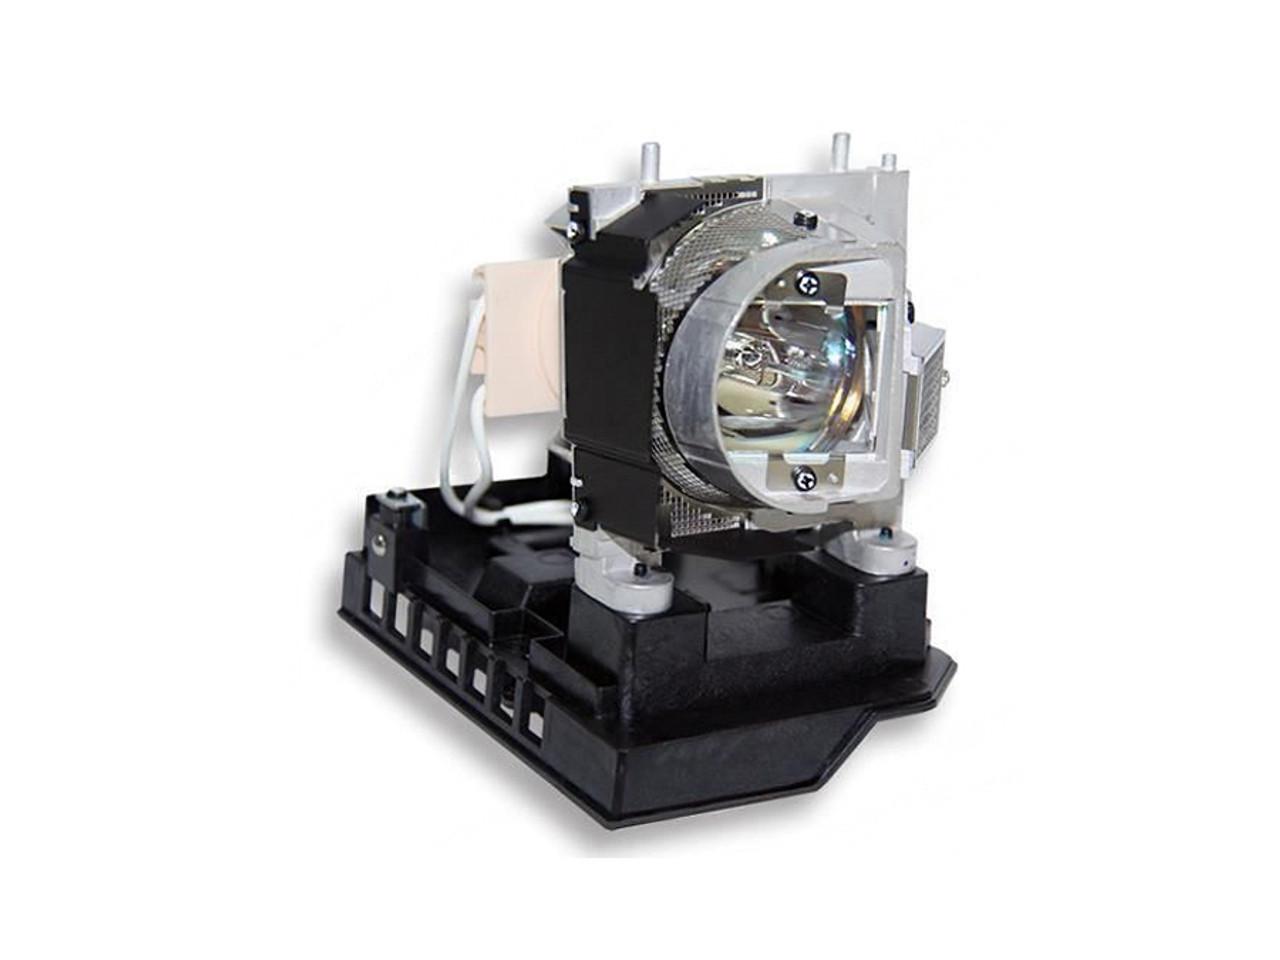 Replacement Projector Lamp for Smartboard 480i5, 880i5, 885i5, LightRaise 40WI, SB880, SLR40WI, UF75, UF75W, Unifi 75, Unifi 75W[NRG480i5UF75]